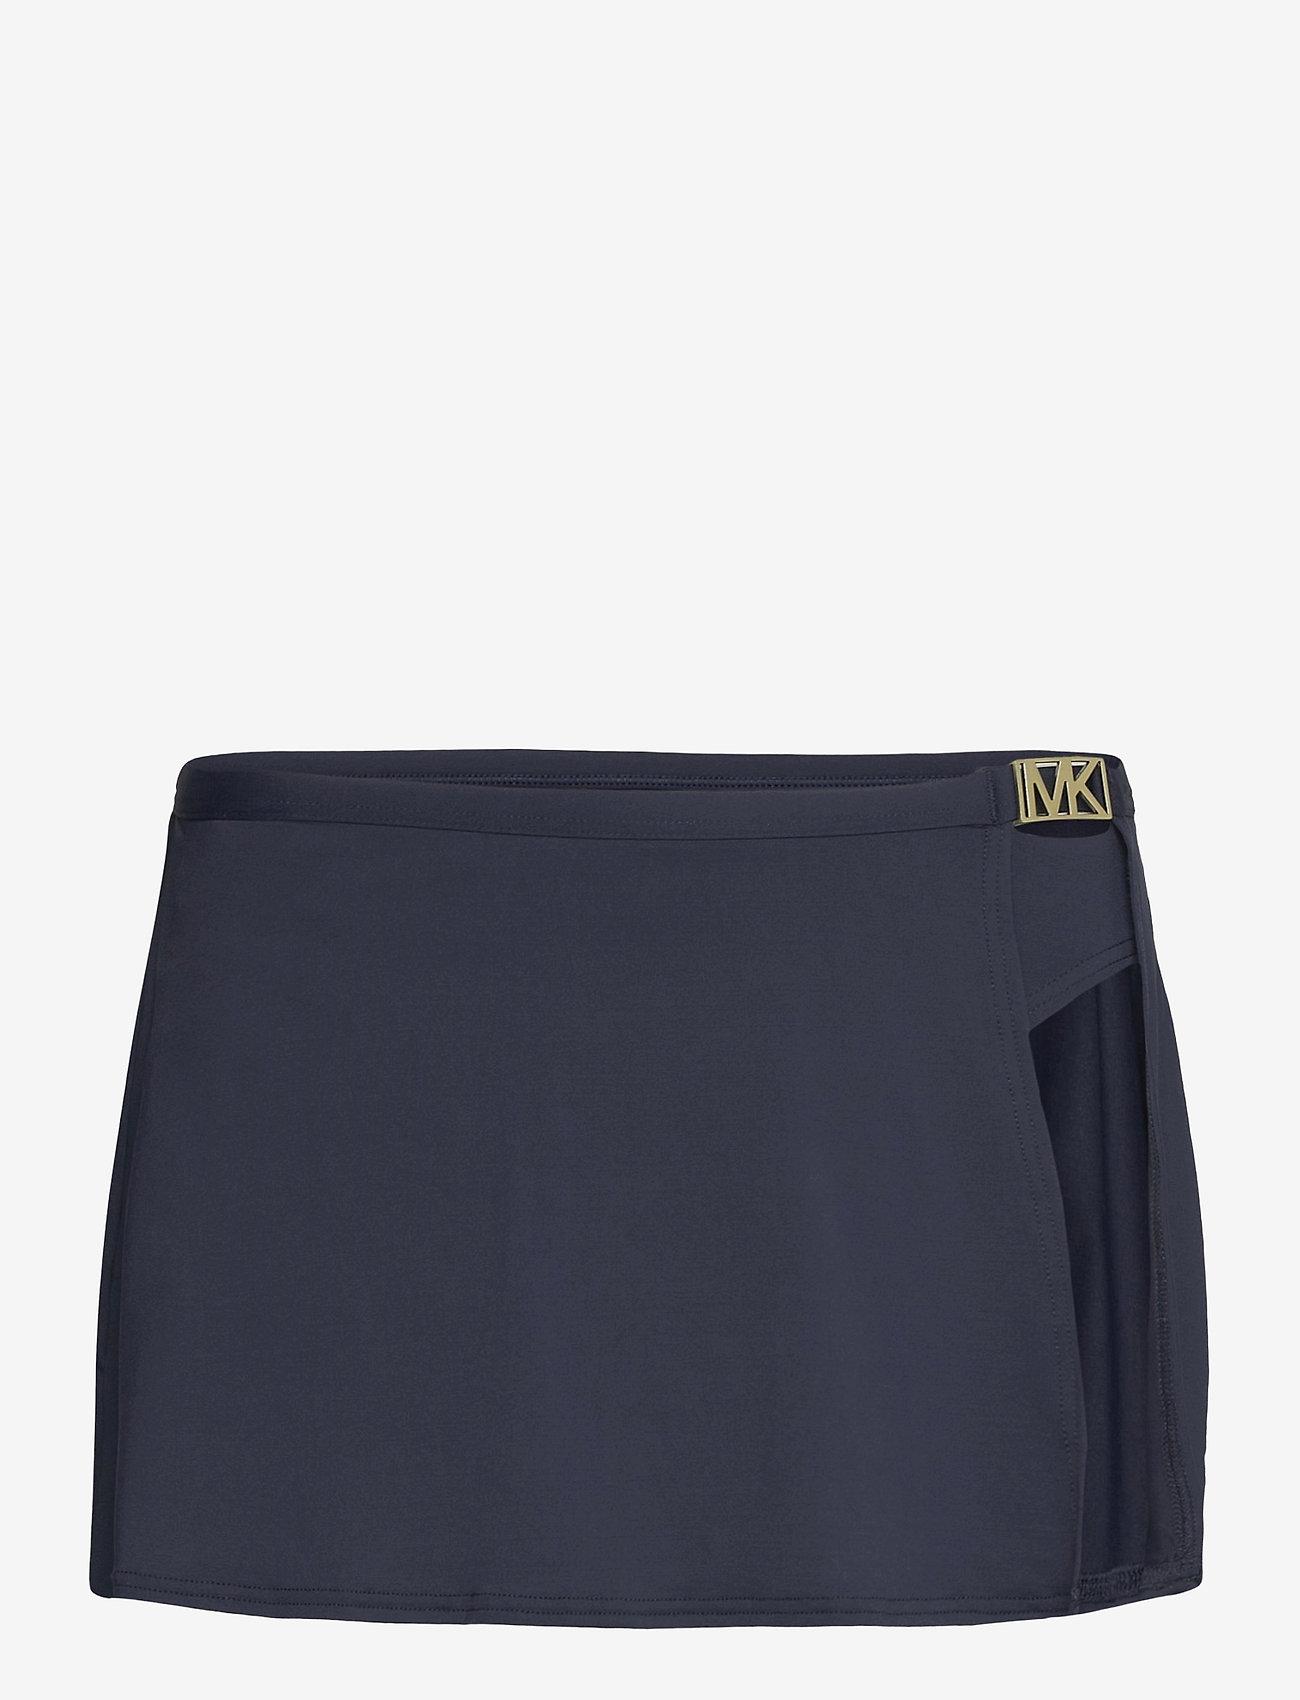 Michael Kors Swimwear - SKIRT BTM - bikinibroekjes - new navy - 0